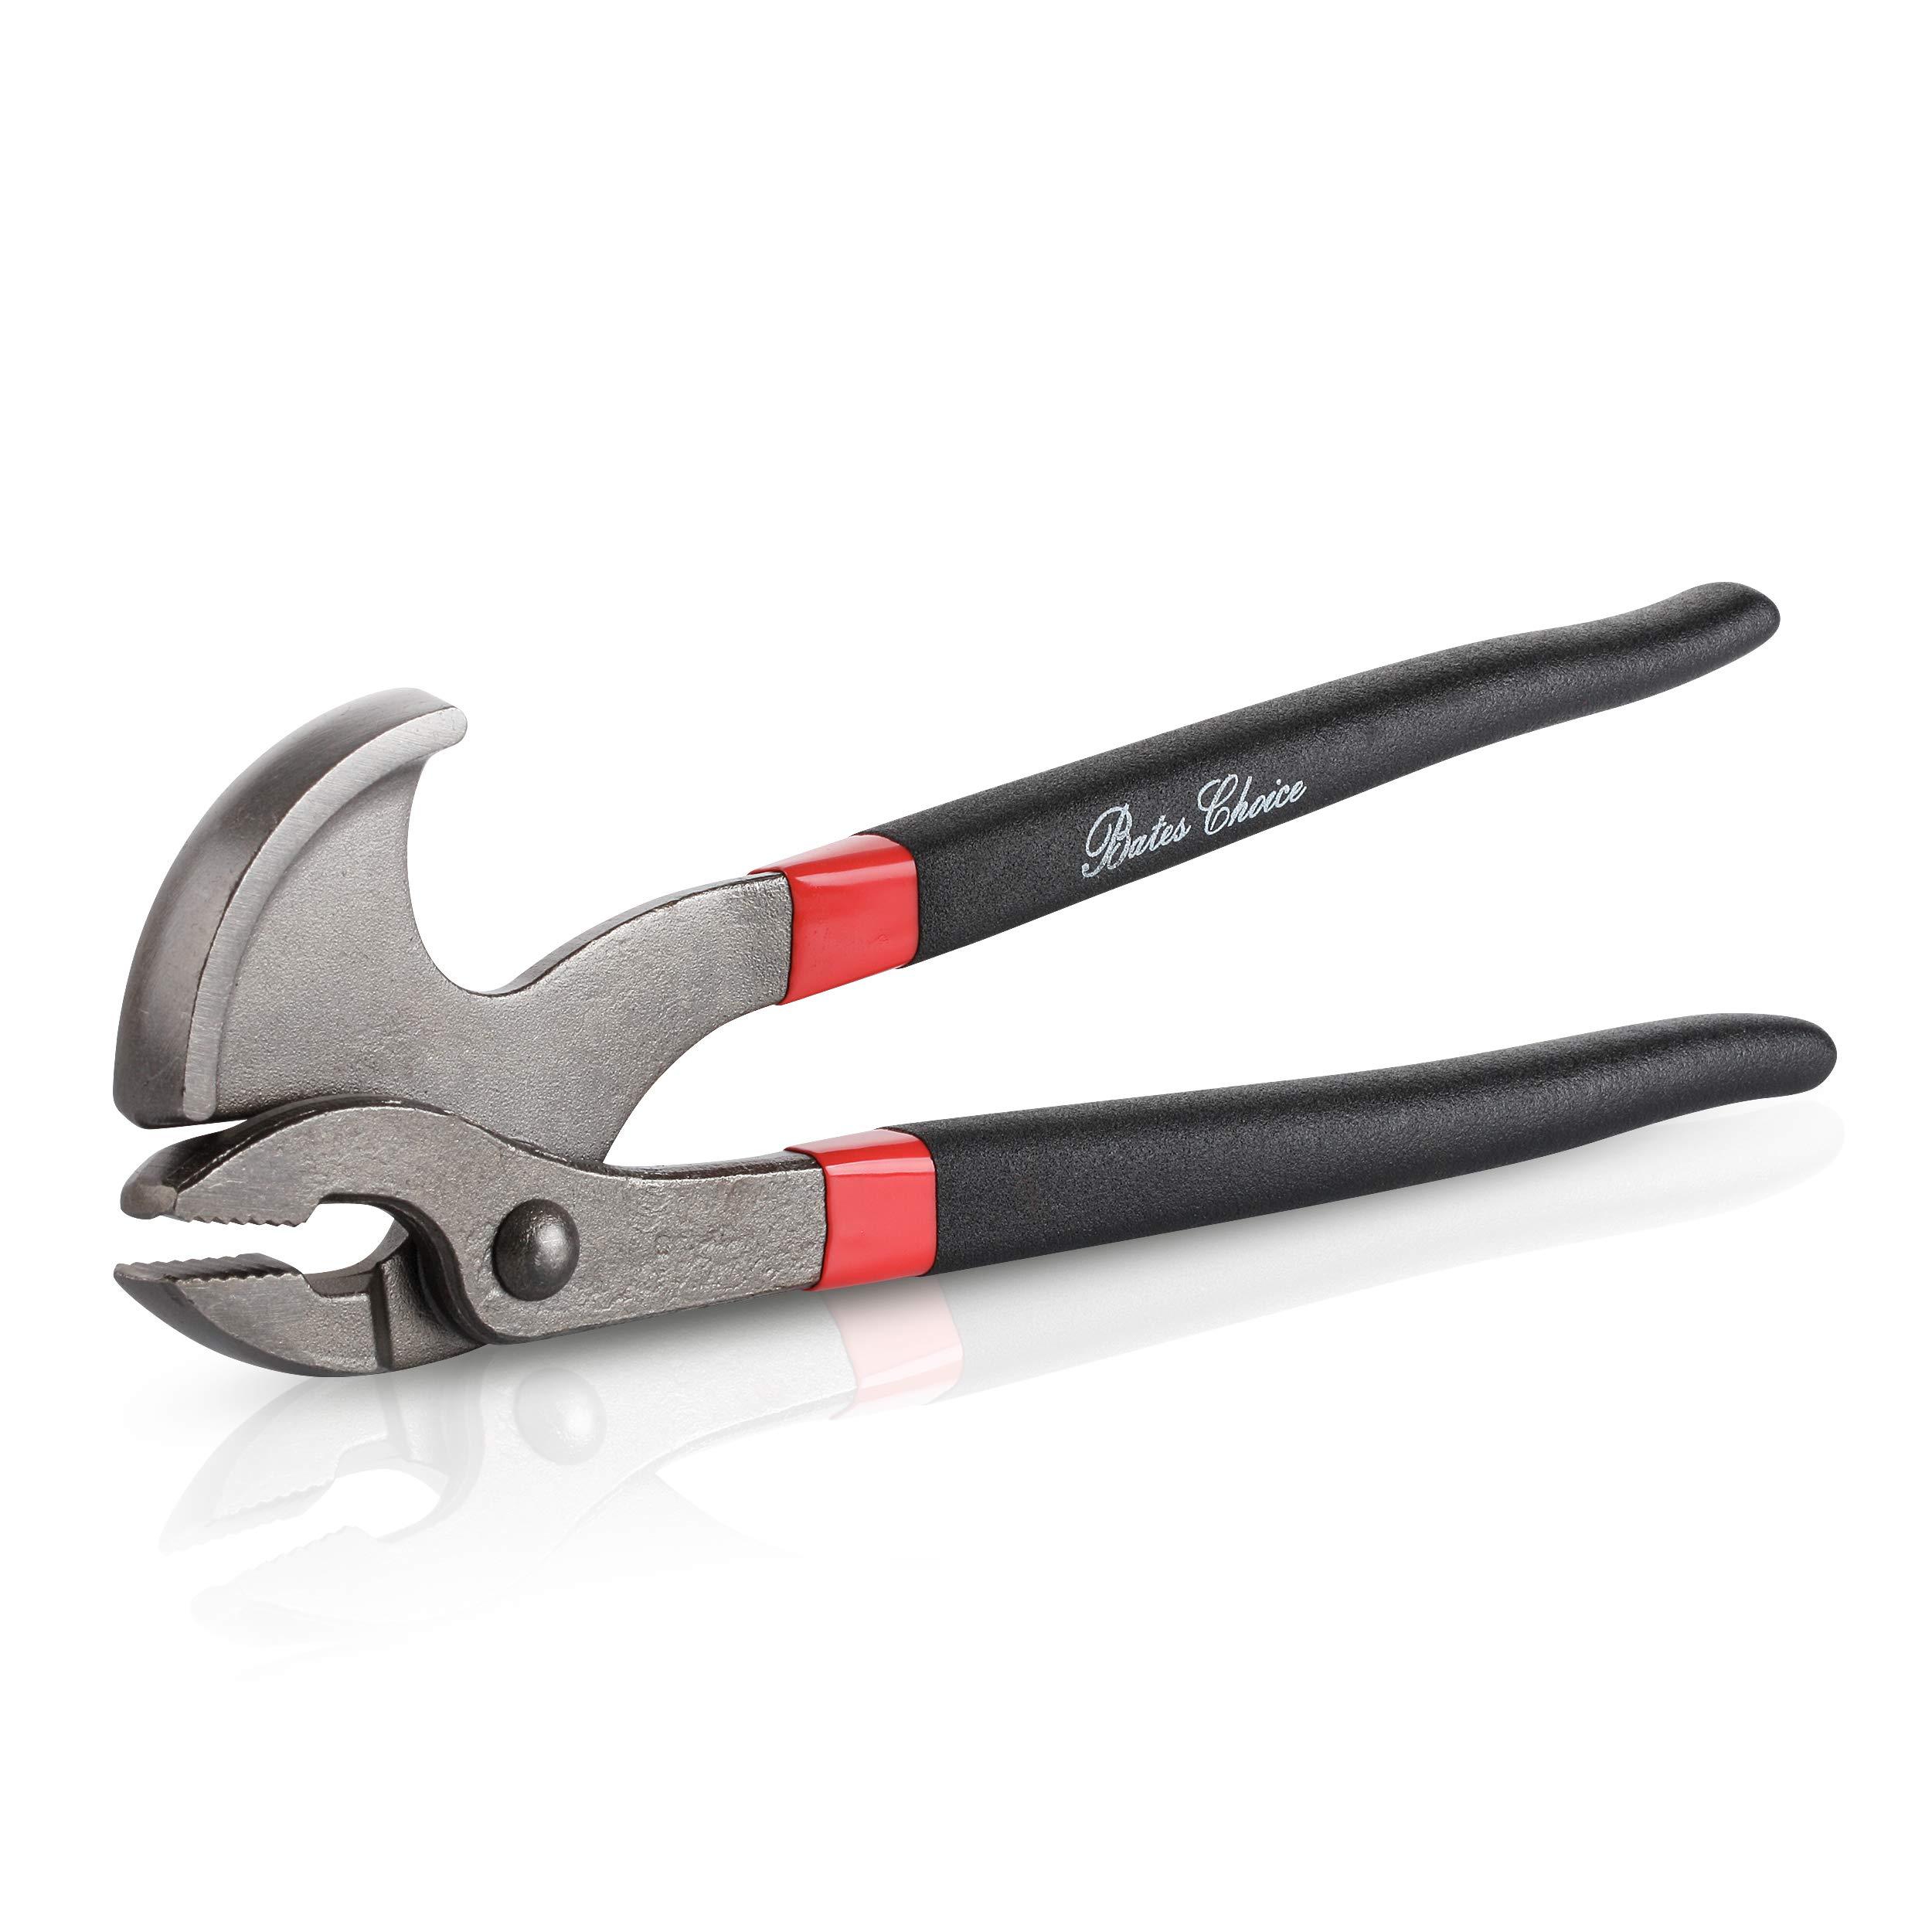 Bates Puller Pliers Remover Carpenter